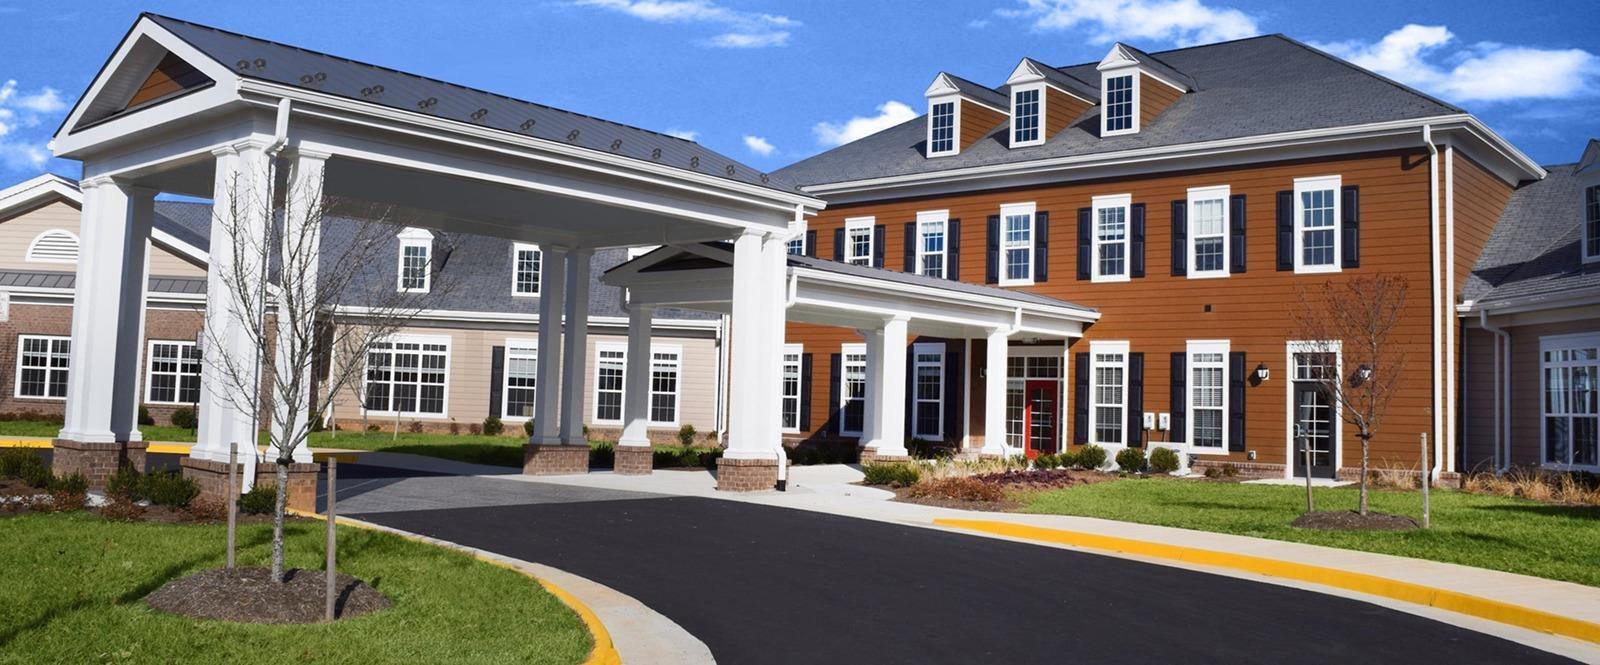 Elegant Exterior View Of Property at Spring Arbor Cottage of Salisbury, Midlothian, VA, 23113